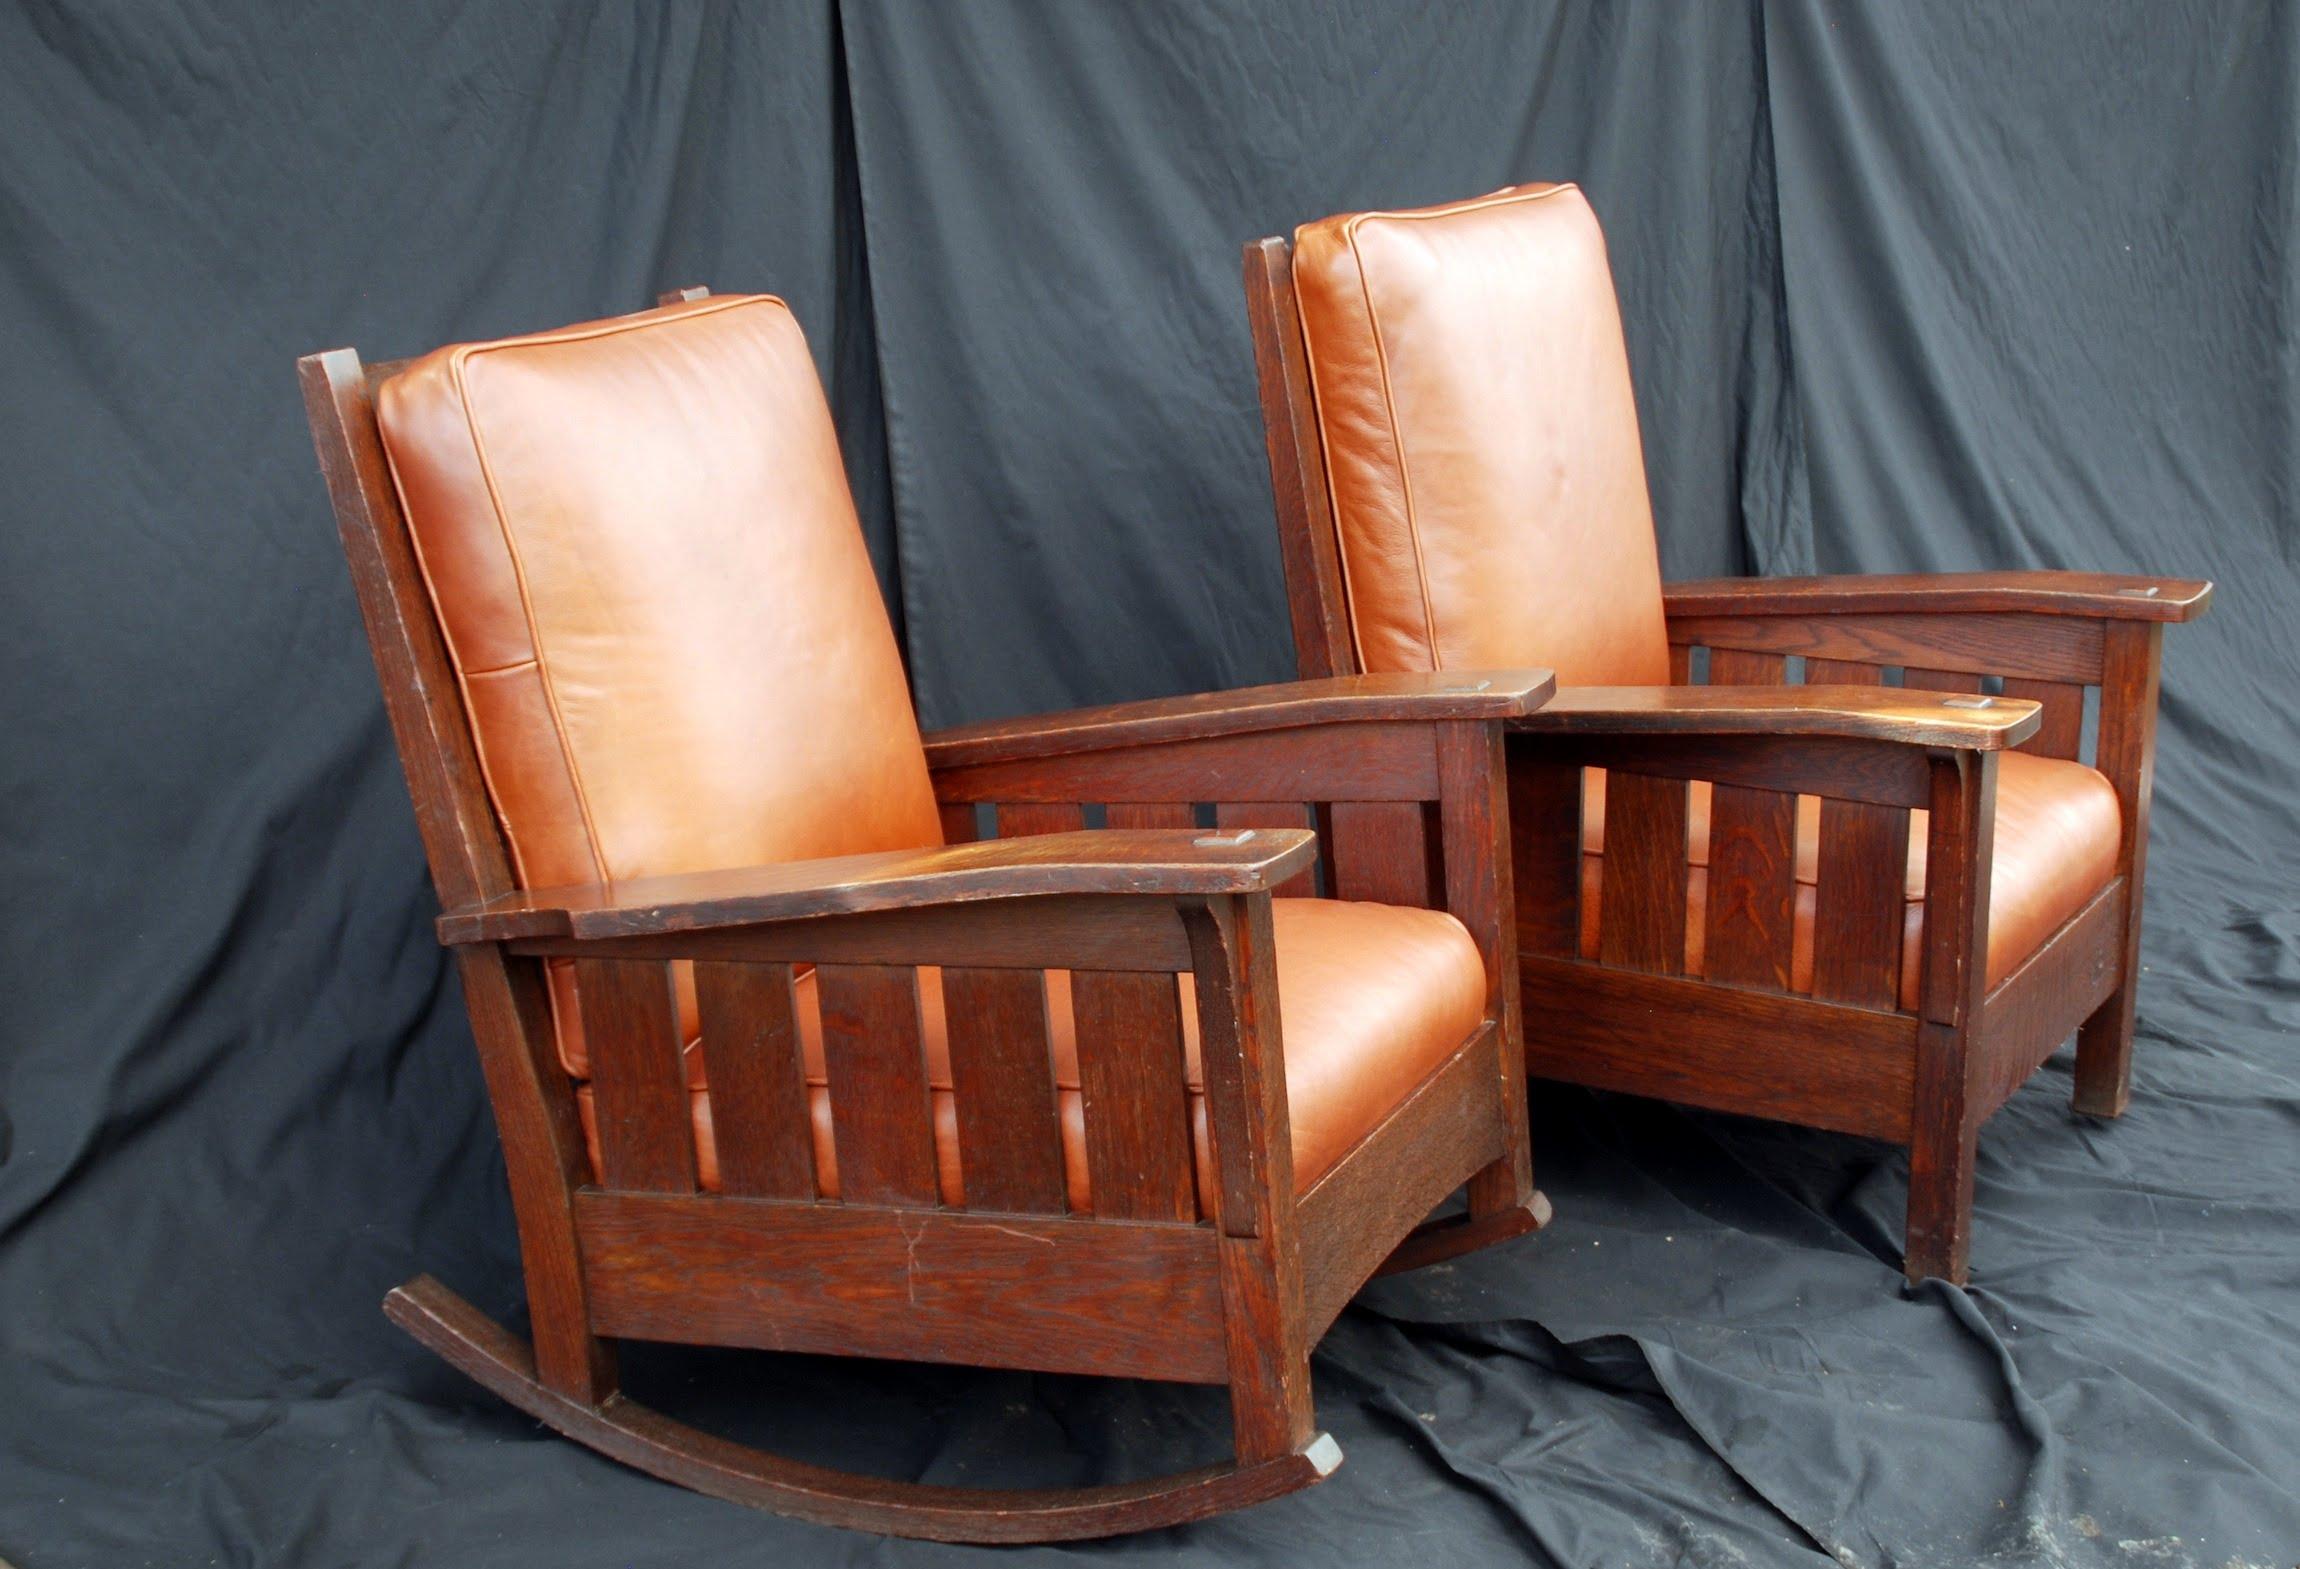 Rare Original L U0026 J G Stickley Slant Arm Rocker And Matching Arm Chair